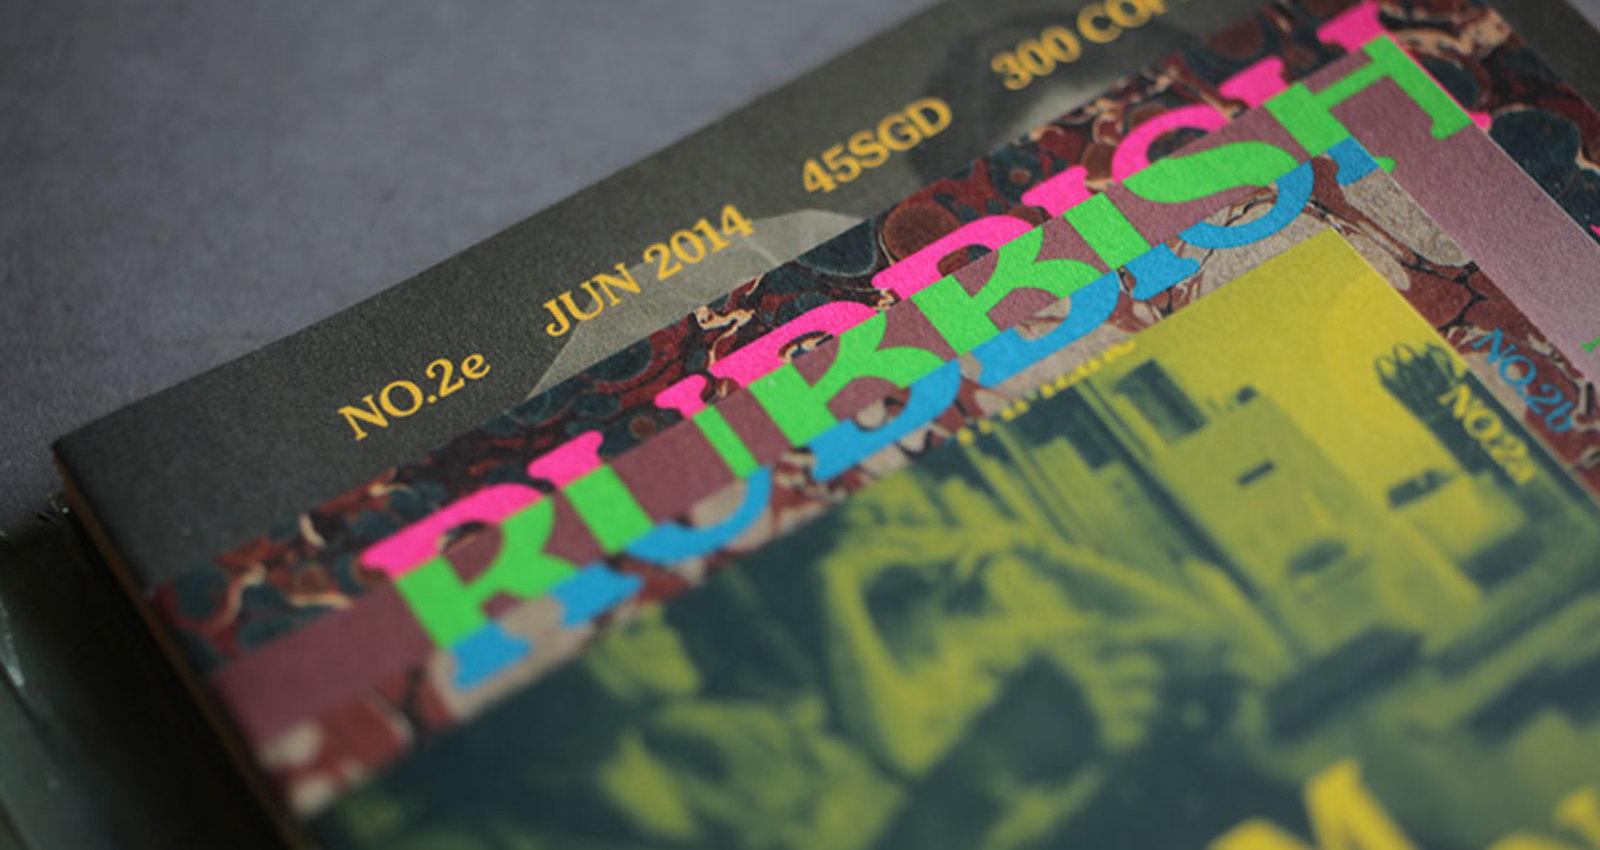 Rubbish Famzine. Till Death Do Us Part